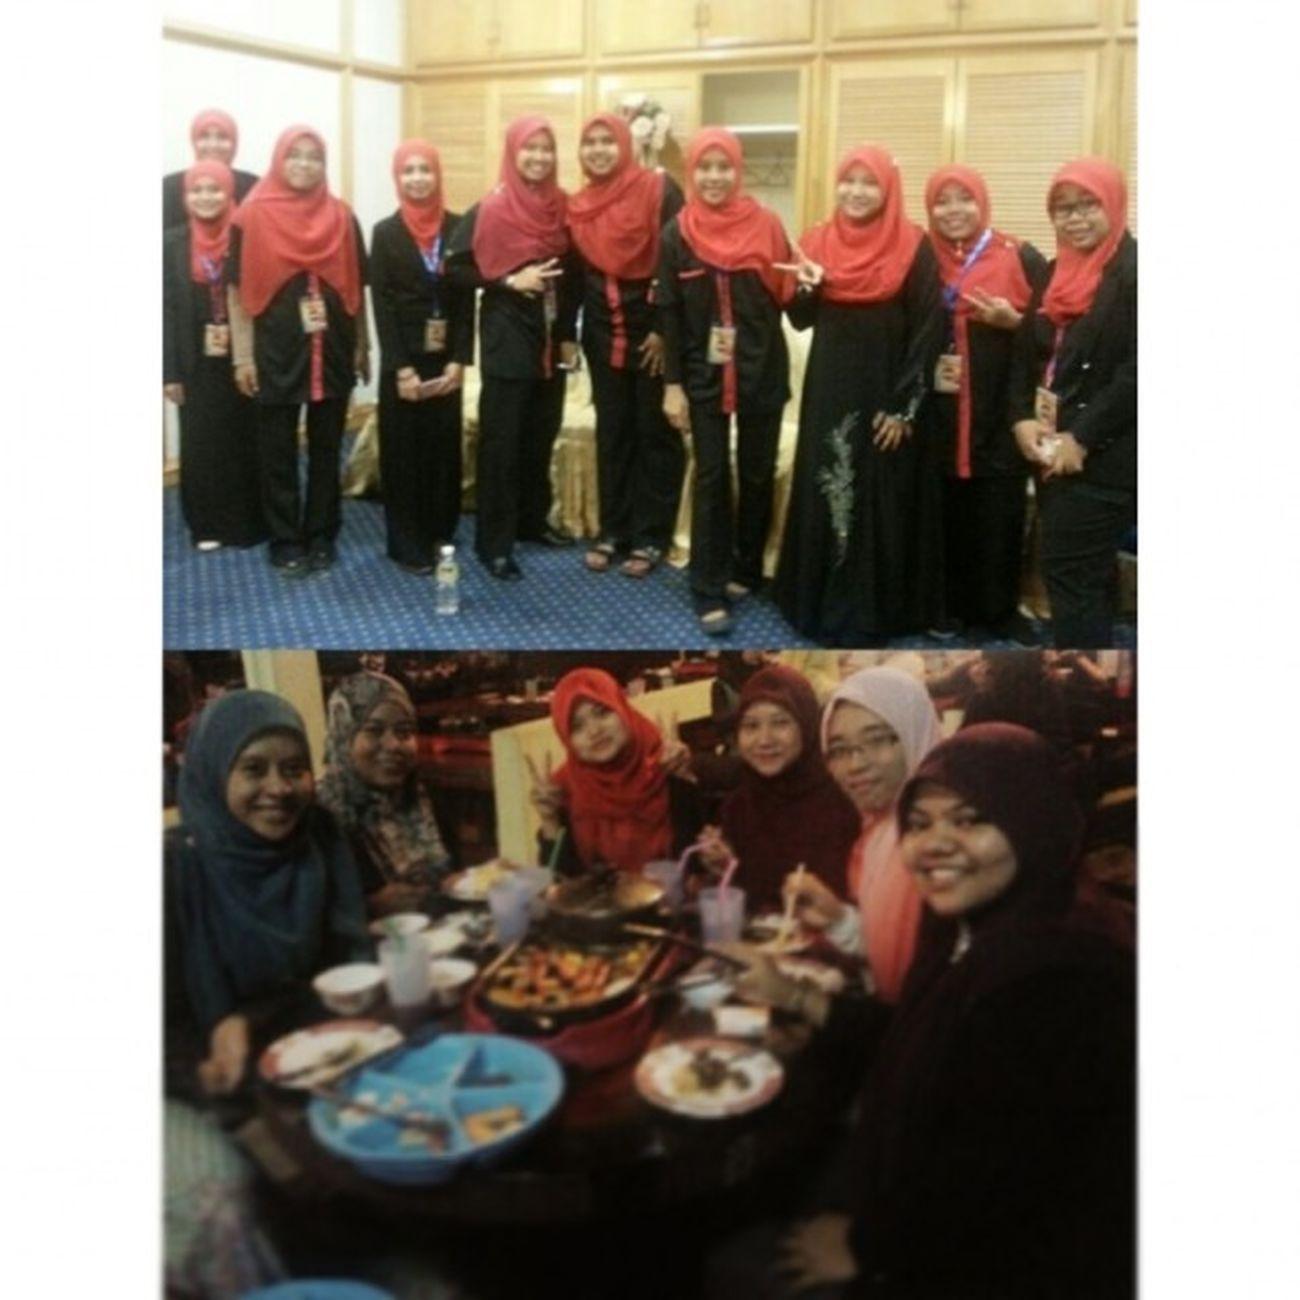 7 days of memories Day 2 - hang out with ajk anugerah kenang jasa (akj) the night before akj event.. Campakbelakang Siangmalamhappy MakanSampaiLebam Besties akjuum